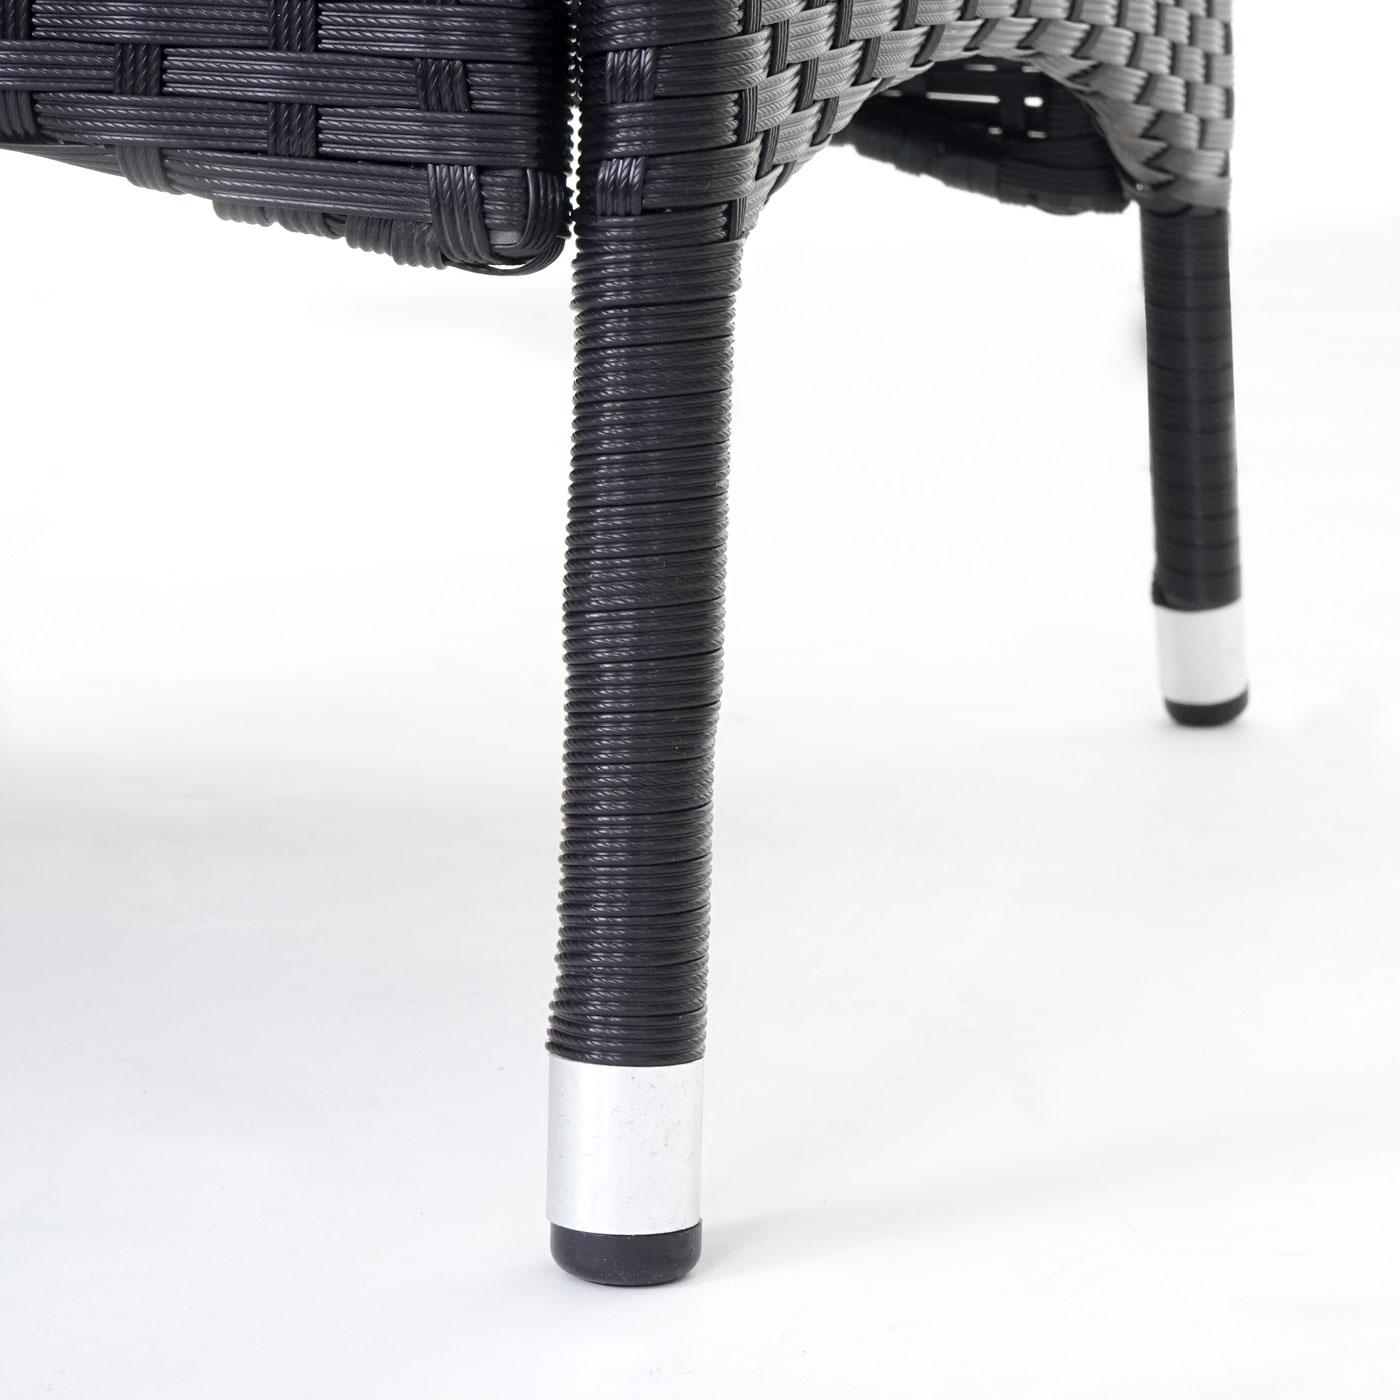 poly rattan garnitur torre garten sitzgruppe tisch 8 sessel alu anthrazit kissen hellgrau. Black Bedroom Furniture Sets. Home Design Ideas